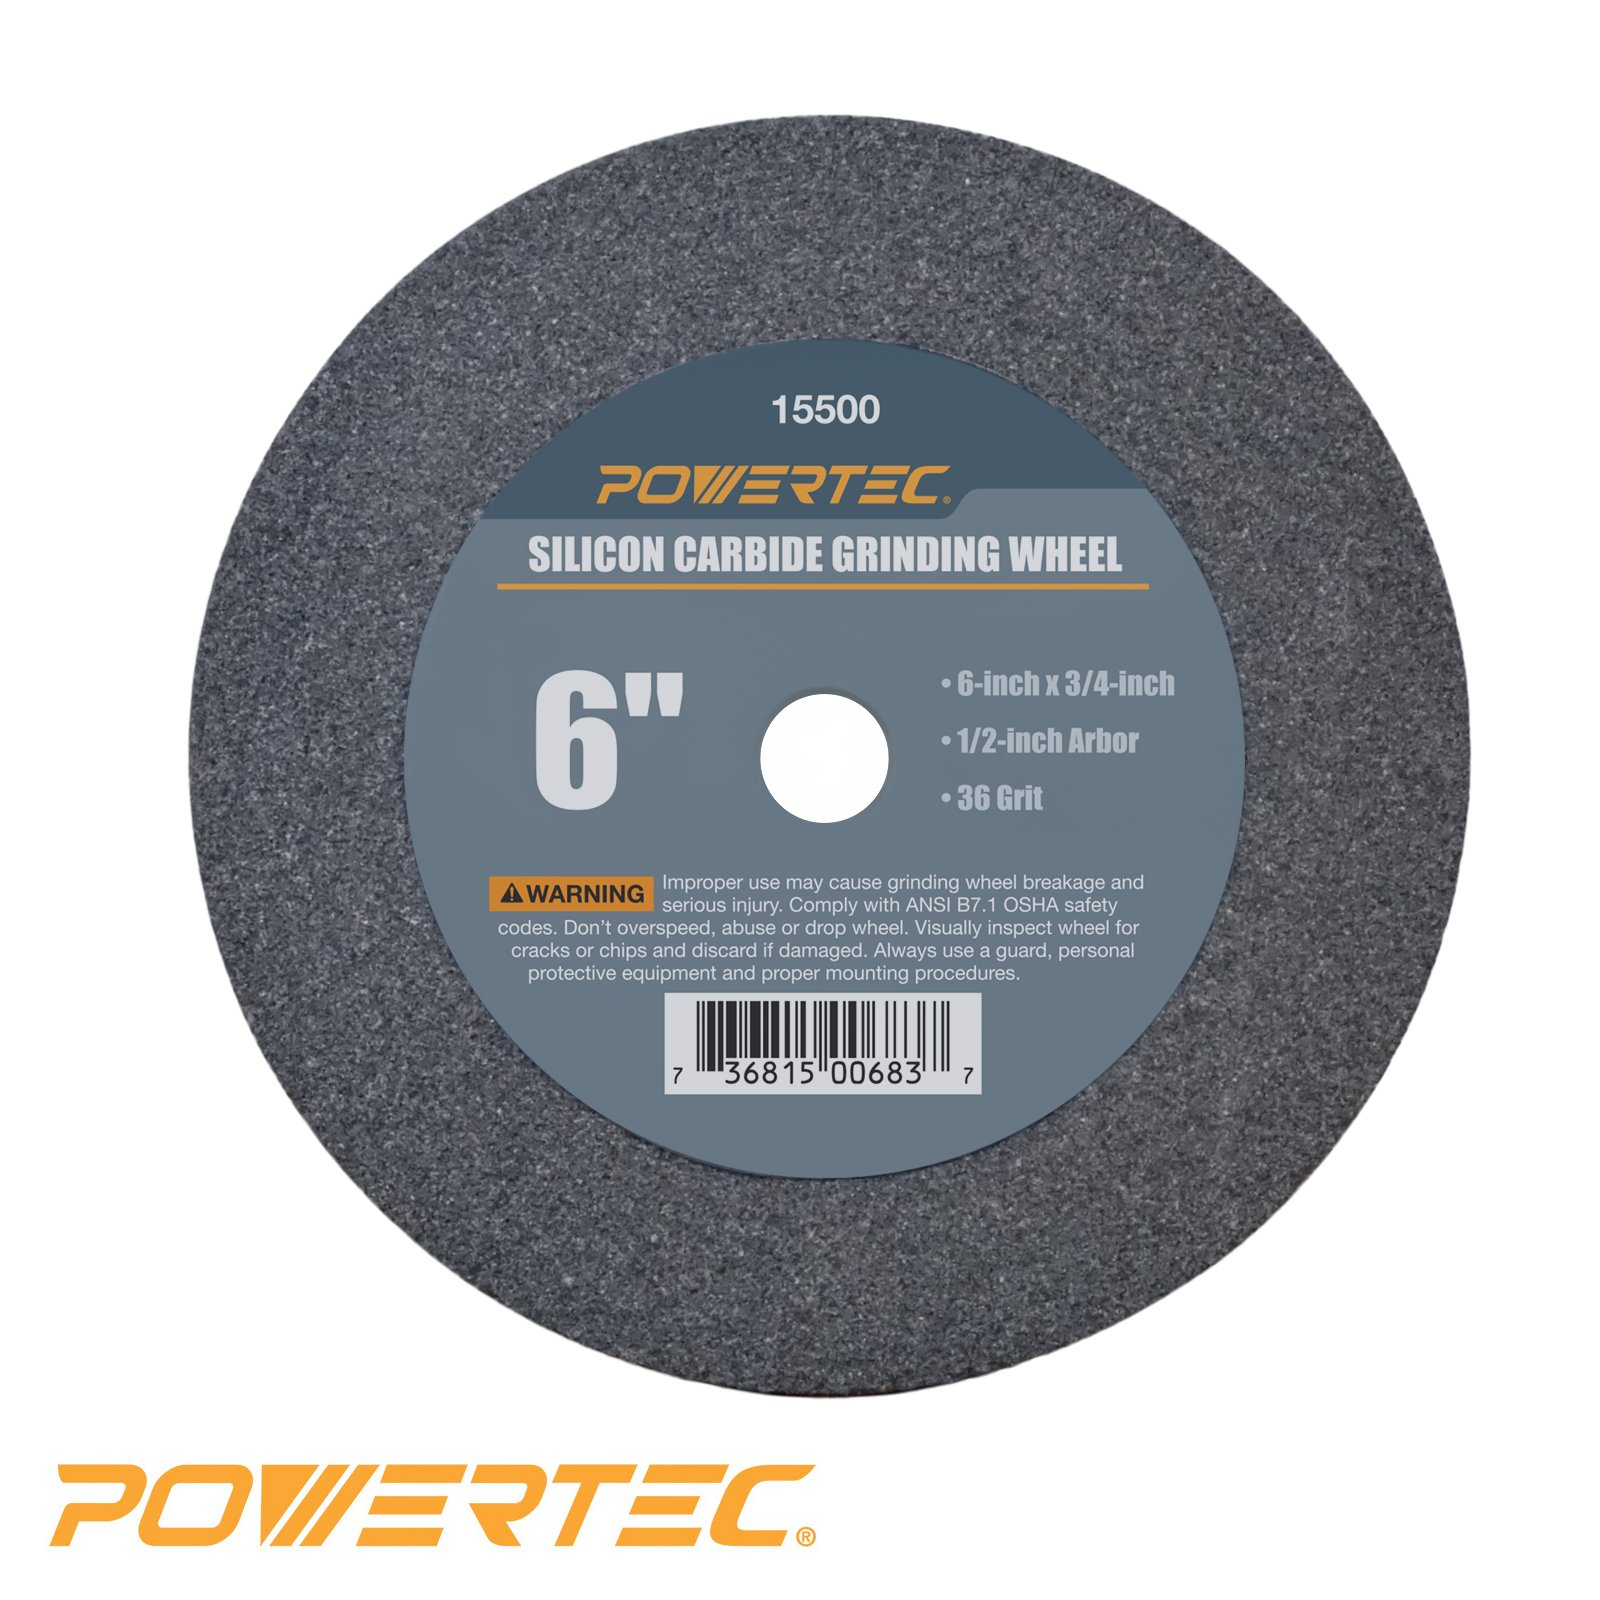 POWERTEC 15500 1/2'' Arbor 36-Grit Silicon Carbide Grinding Wheel, 6'' by 3/4''